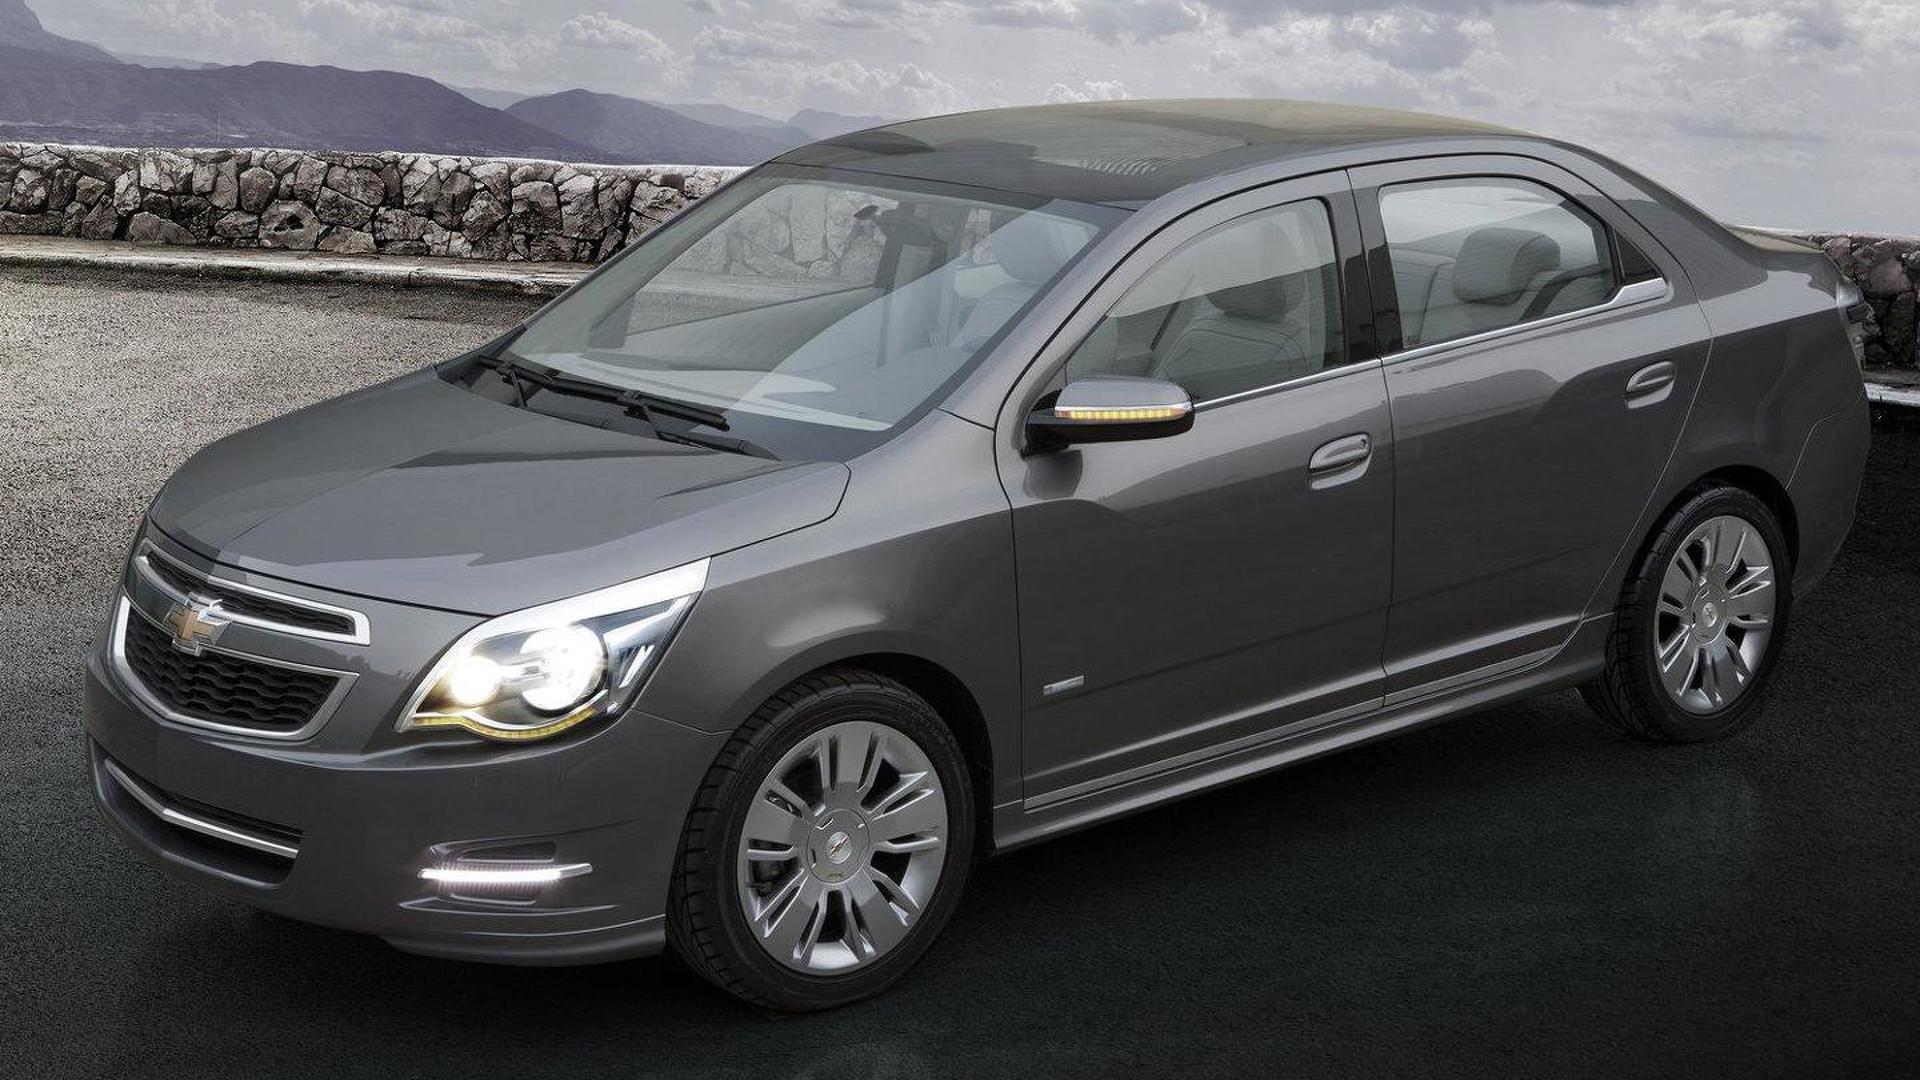 Chevrolet Cobalt Sedan Concept debuts in Buenos Aires